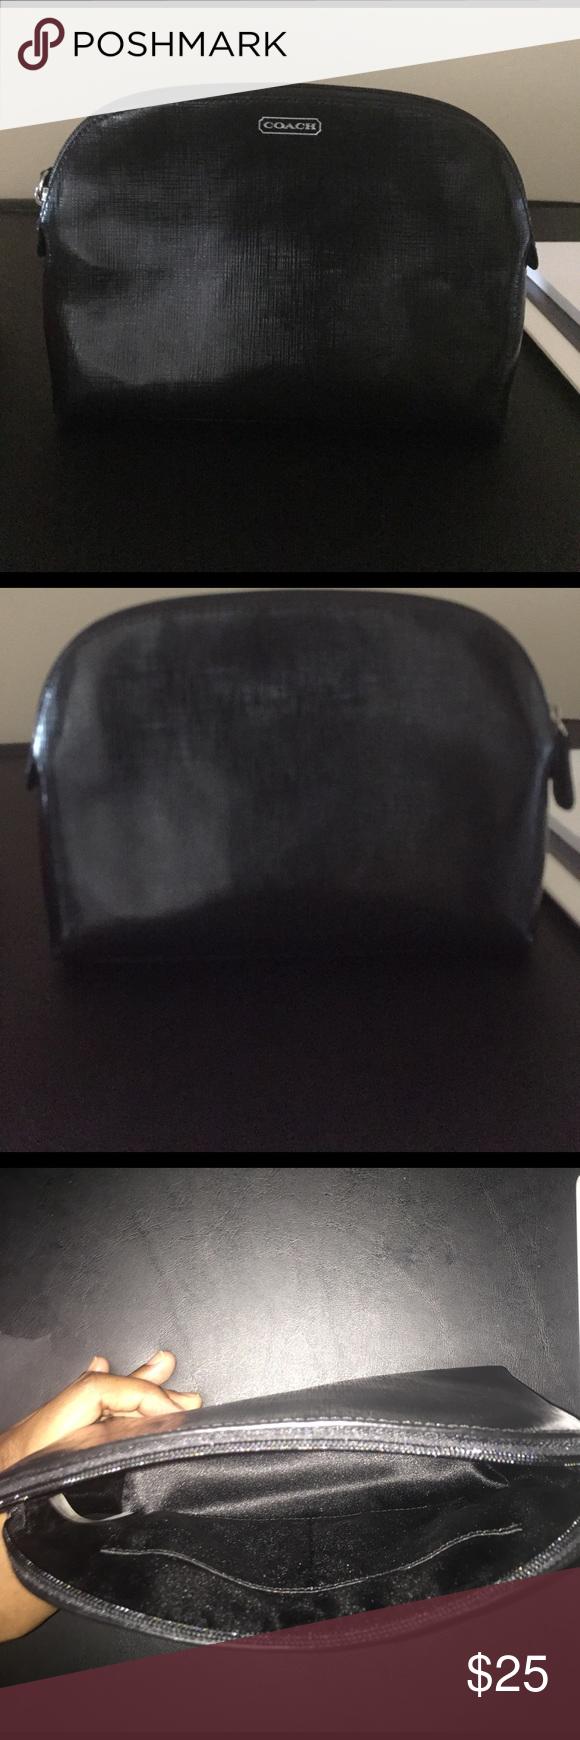 Coach cosmetic bag NWOT Cosmetic bag, Bags, Cosmetics